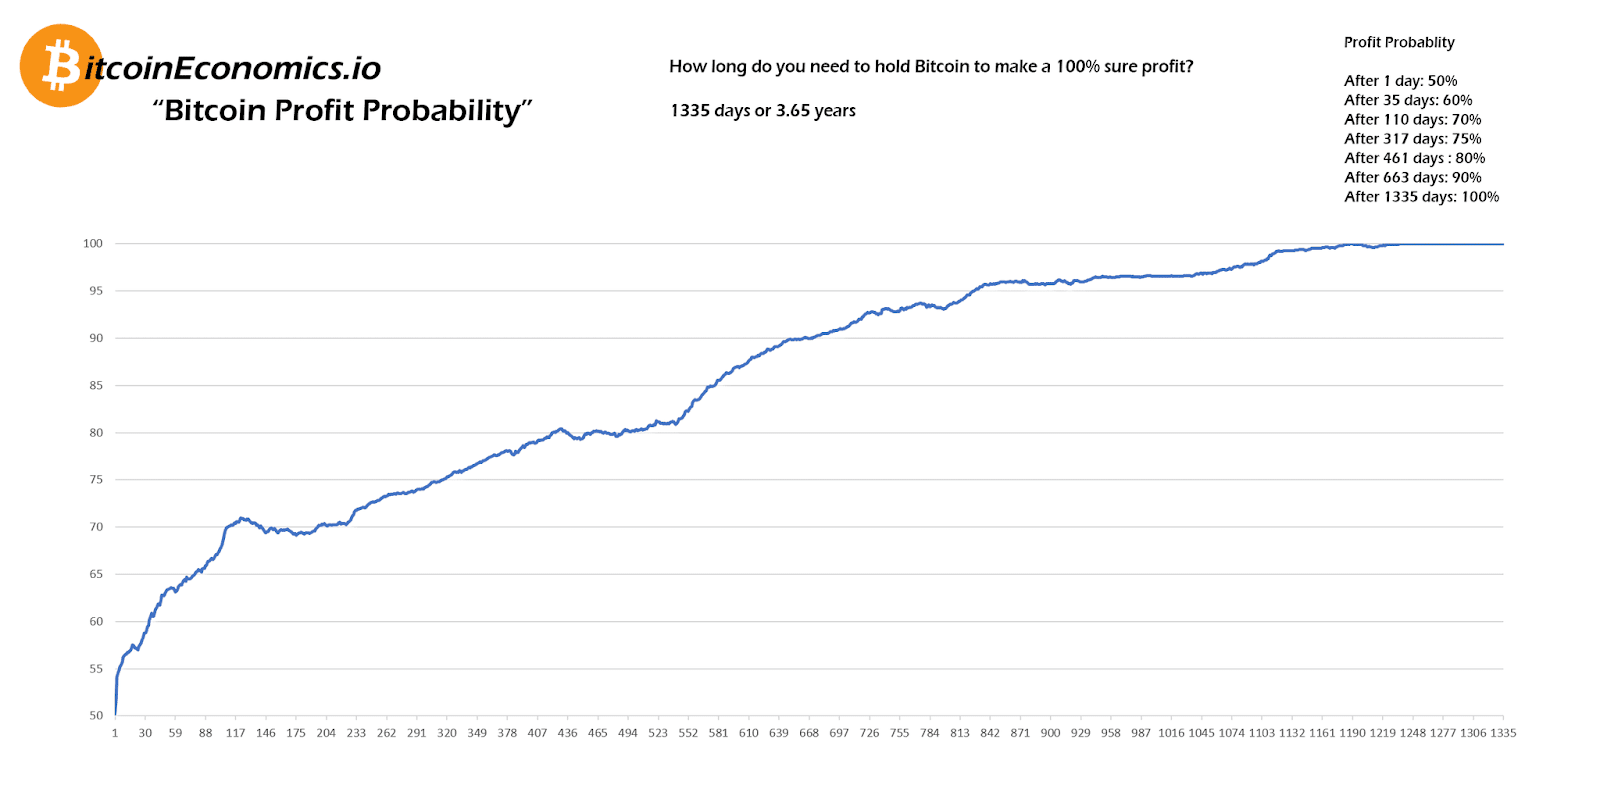 Bitcoin Profit Probability chart